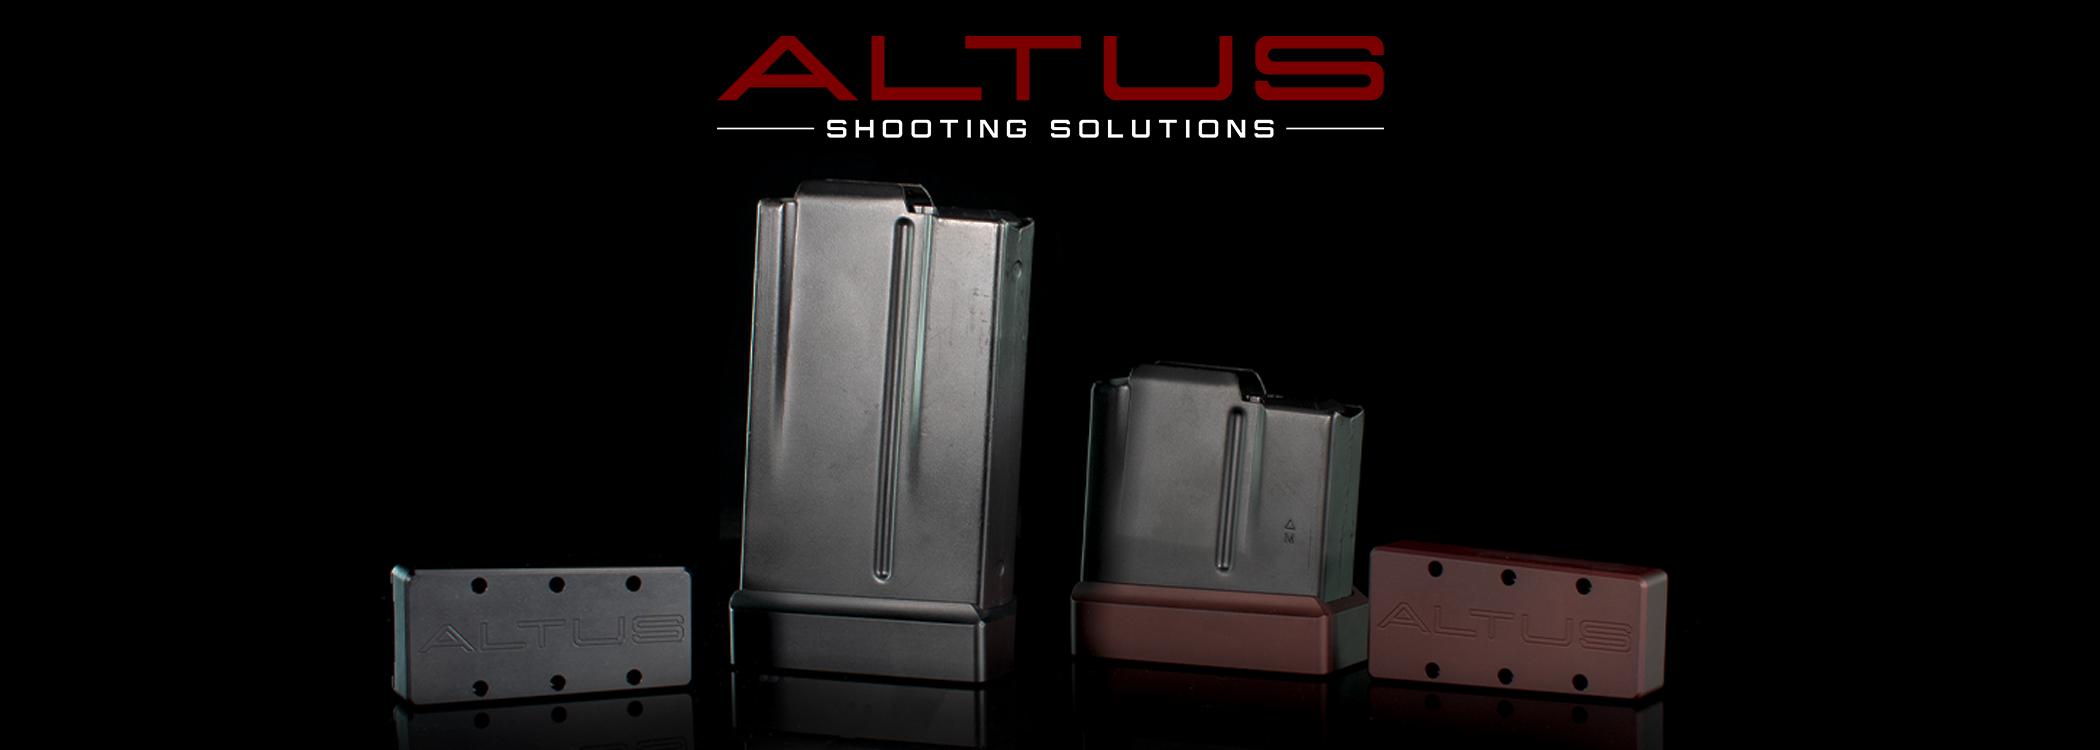 altus-collection-photo.jpg